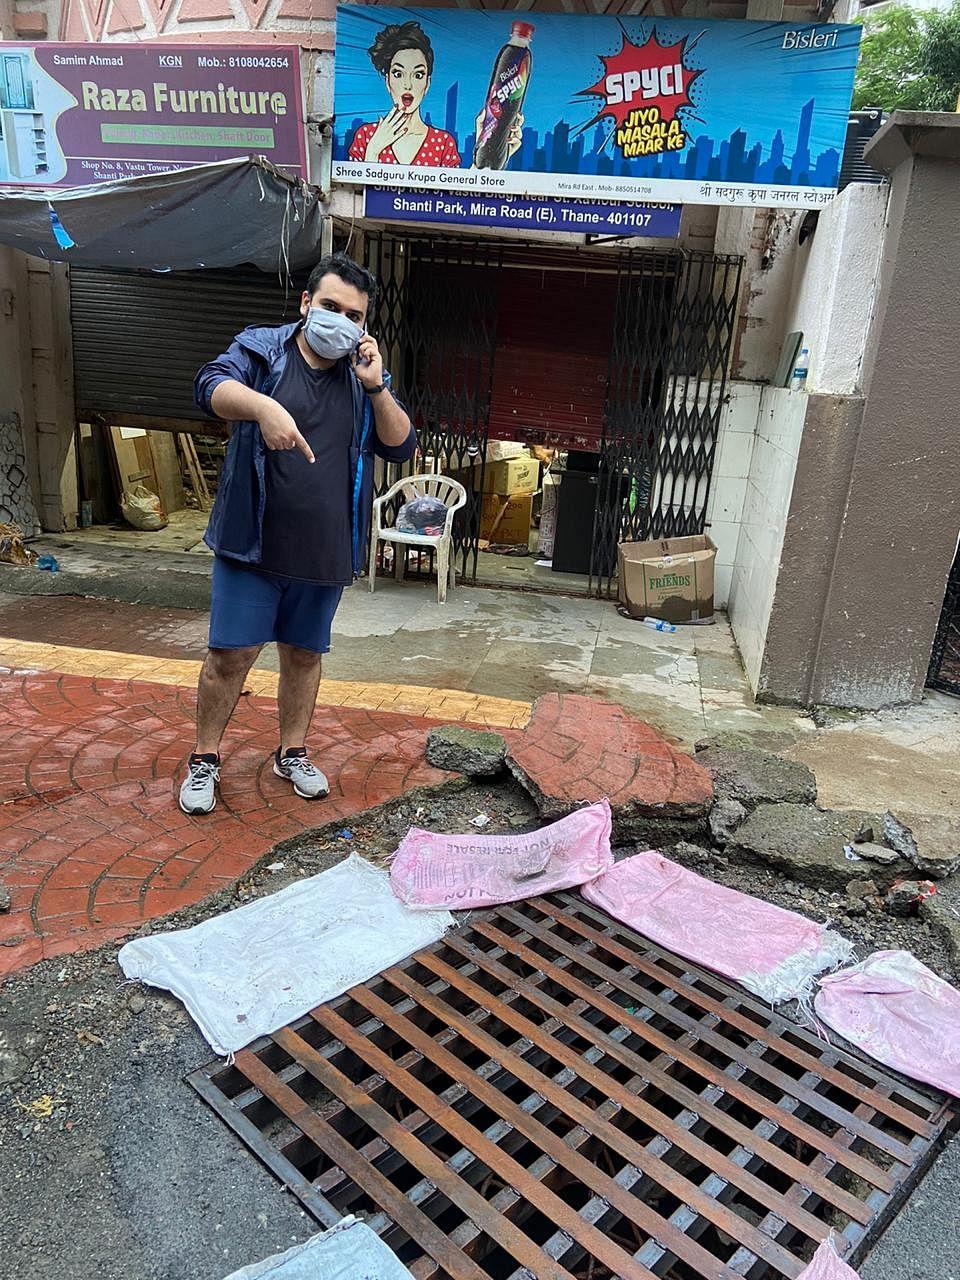 Angels of Mumbai: This Mumbaikar is using social media to solve civic issues